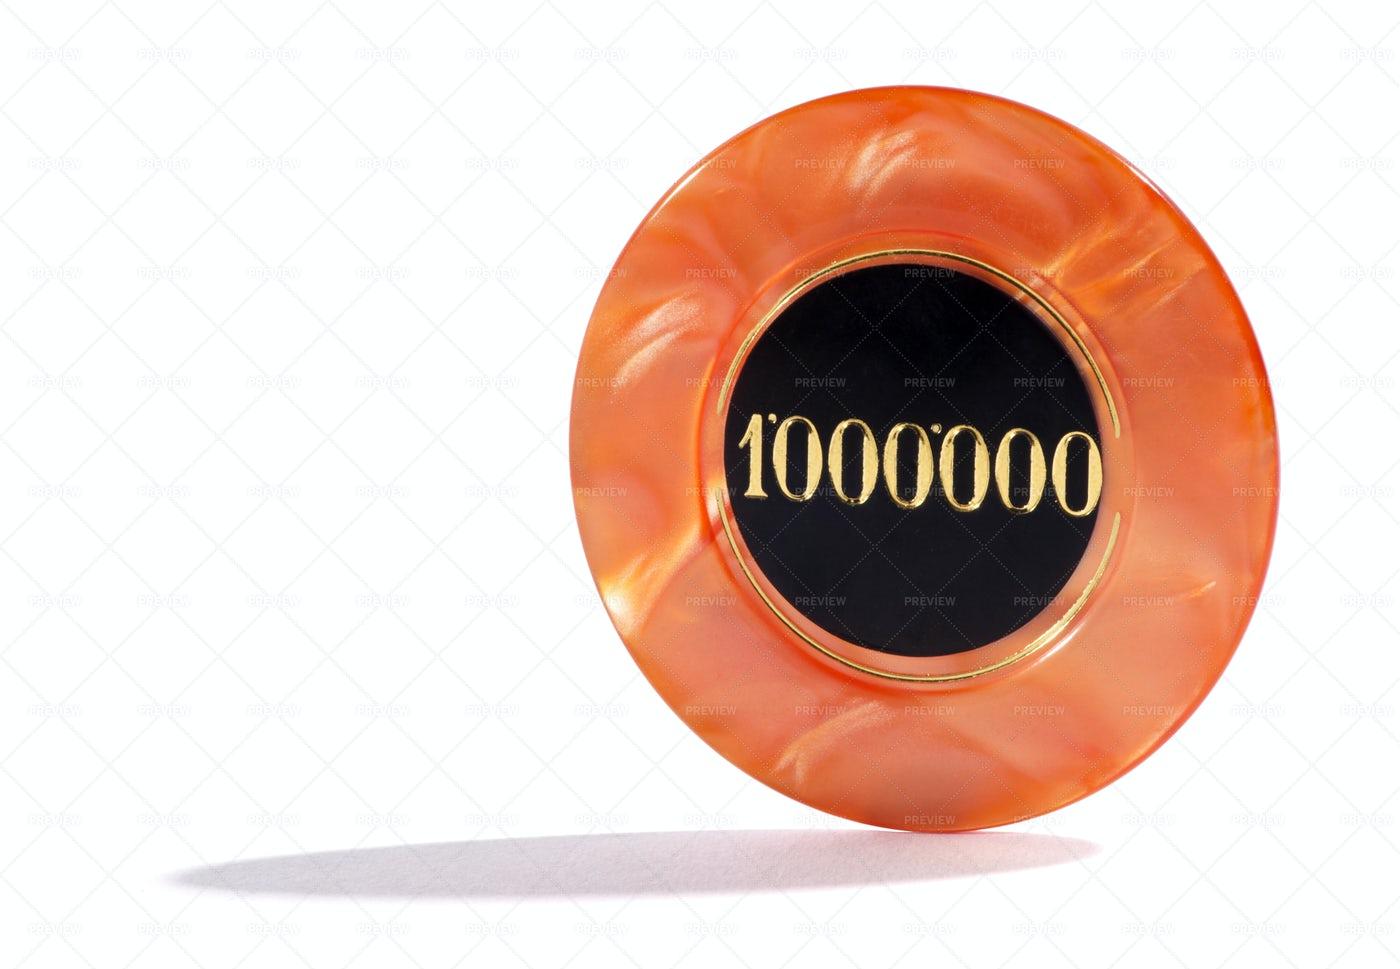 One Million Casino Chip: Stock Photos